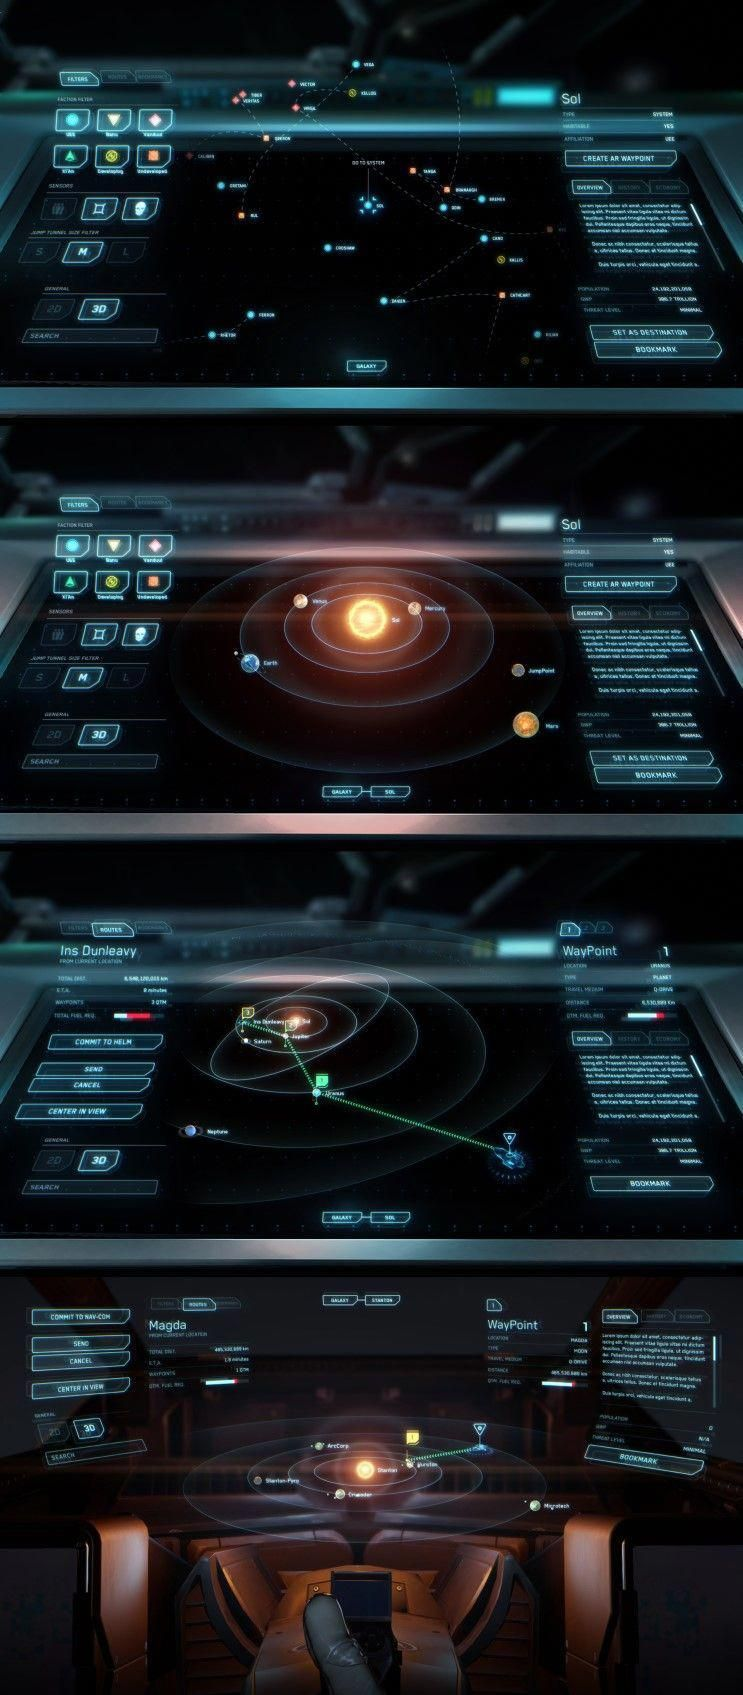 Pin on Video Games (Art and Screenshots)